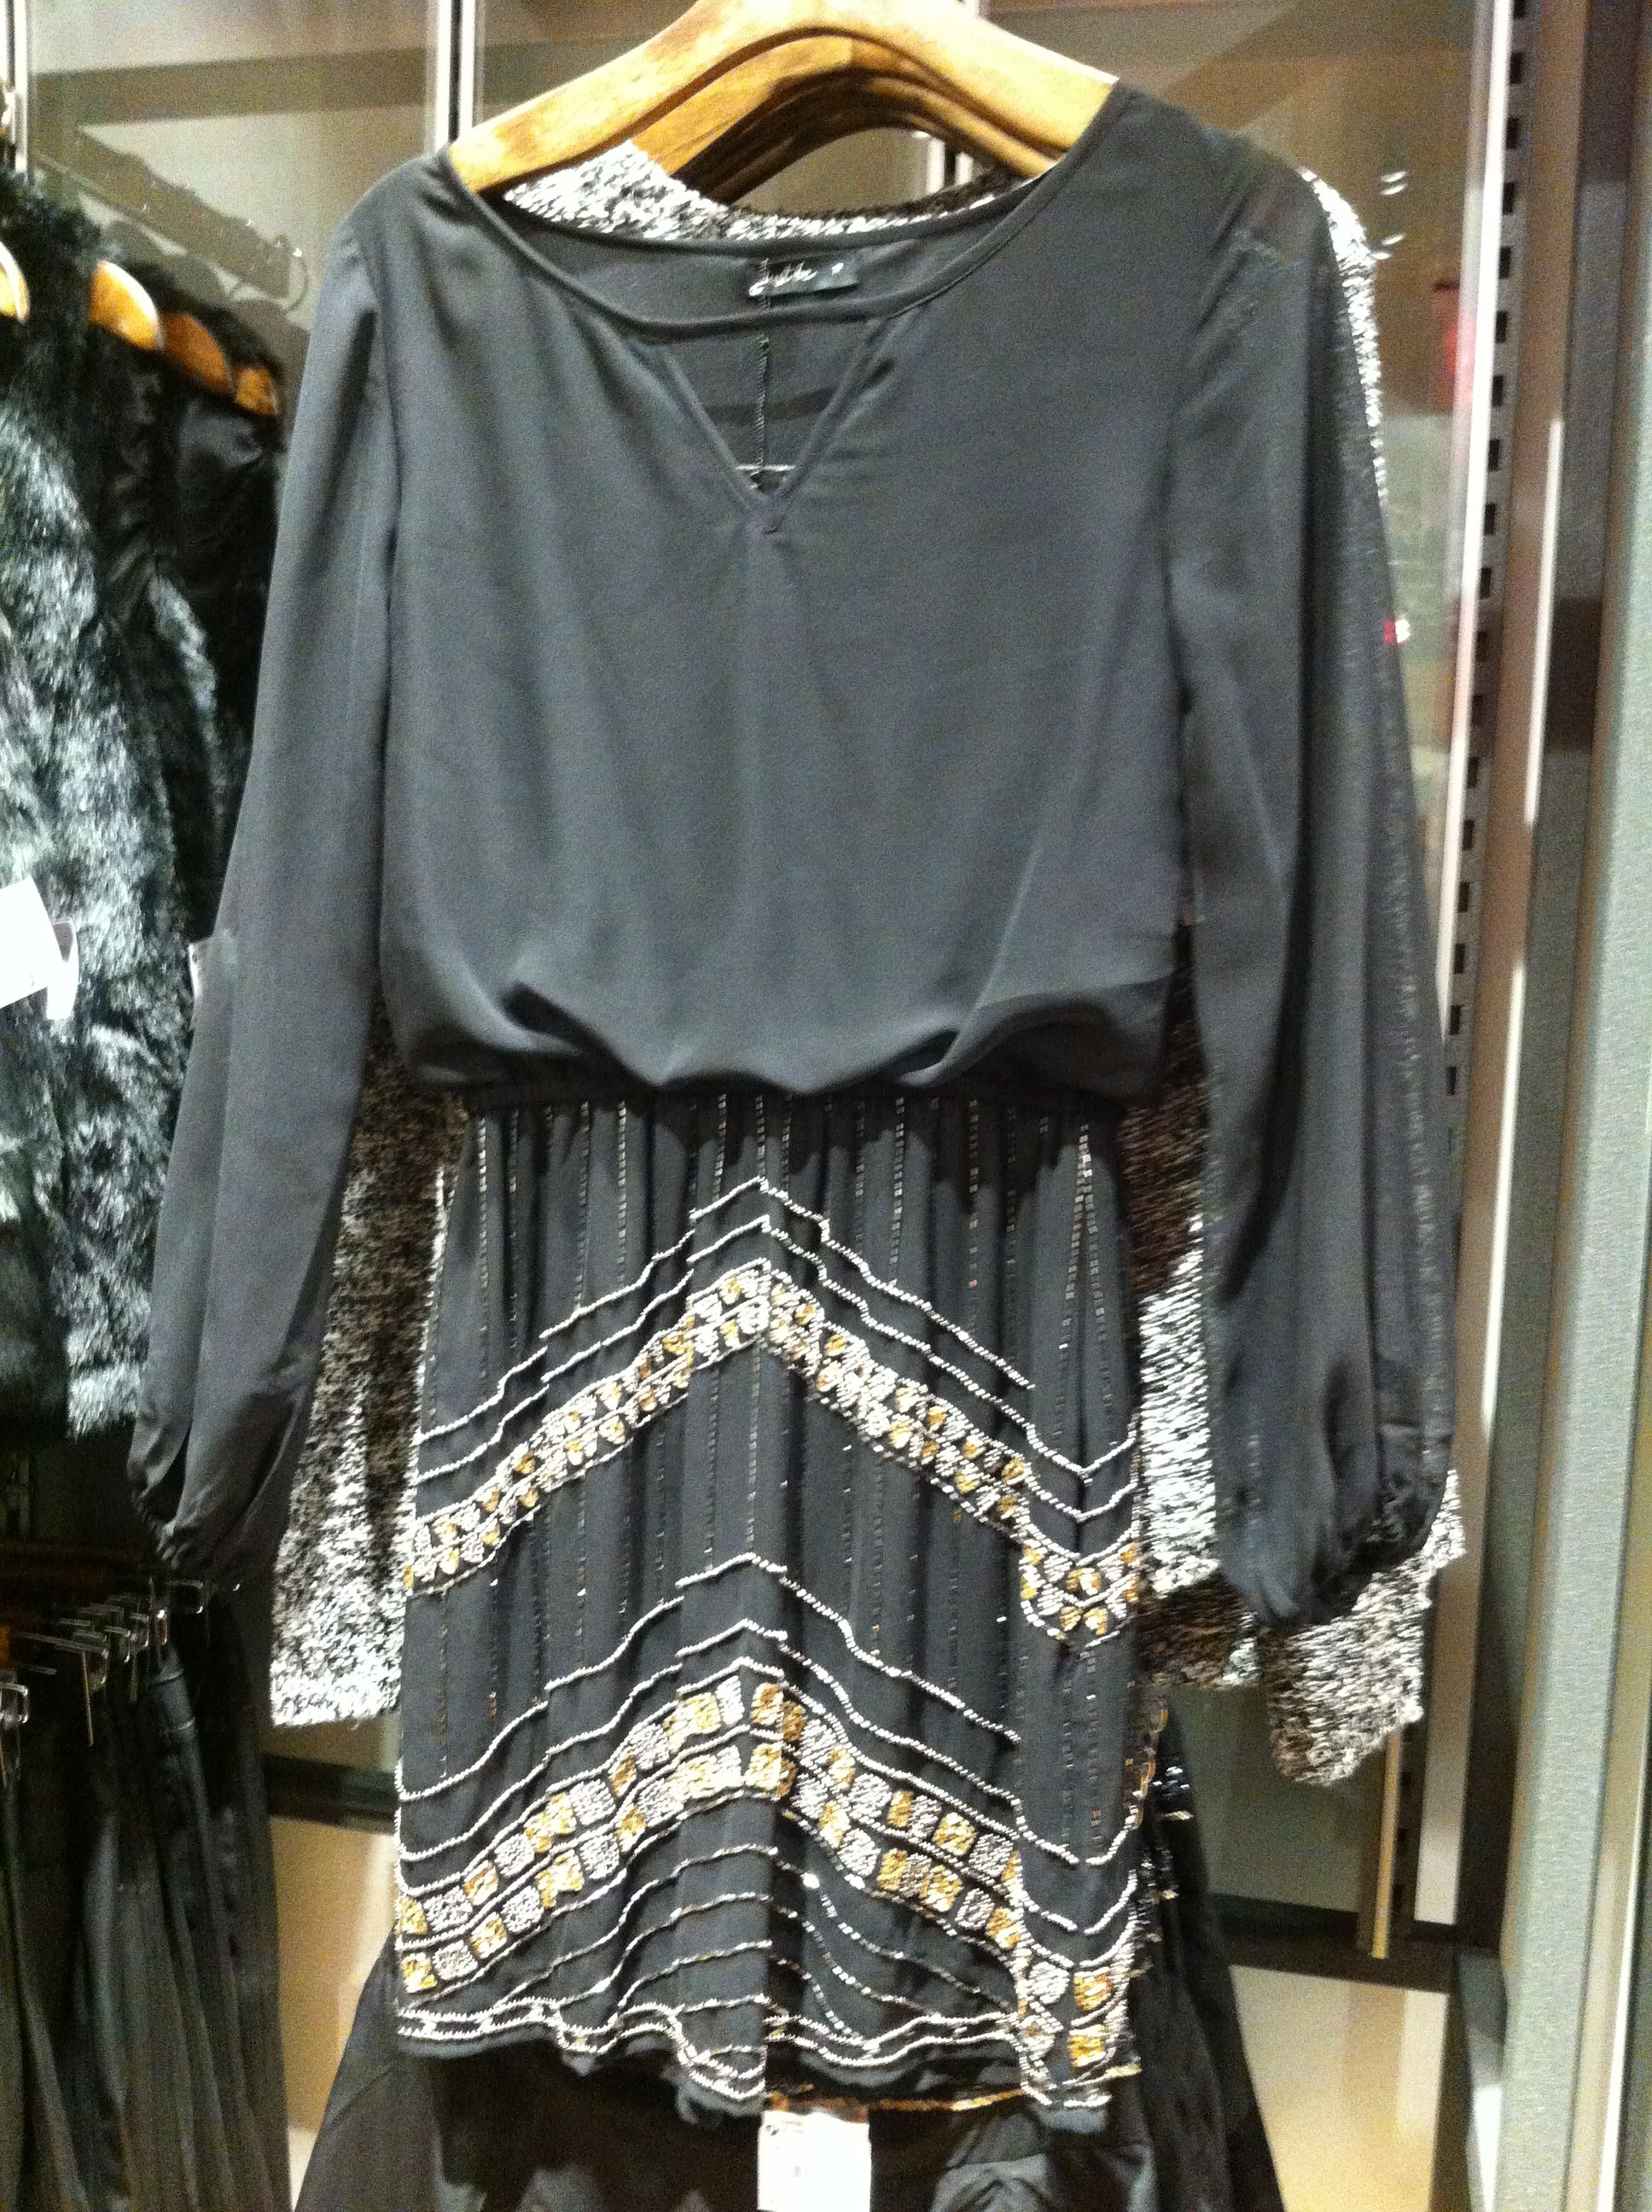 Amei esse vestido! Lojas Renner